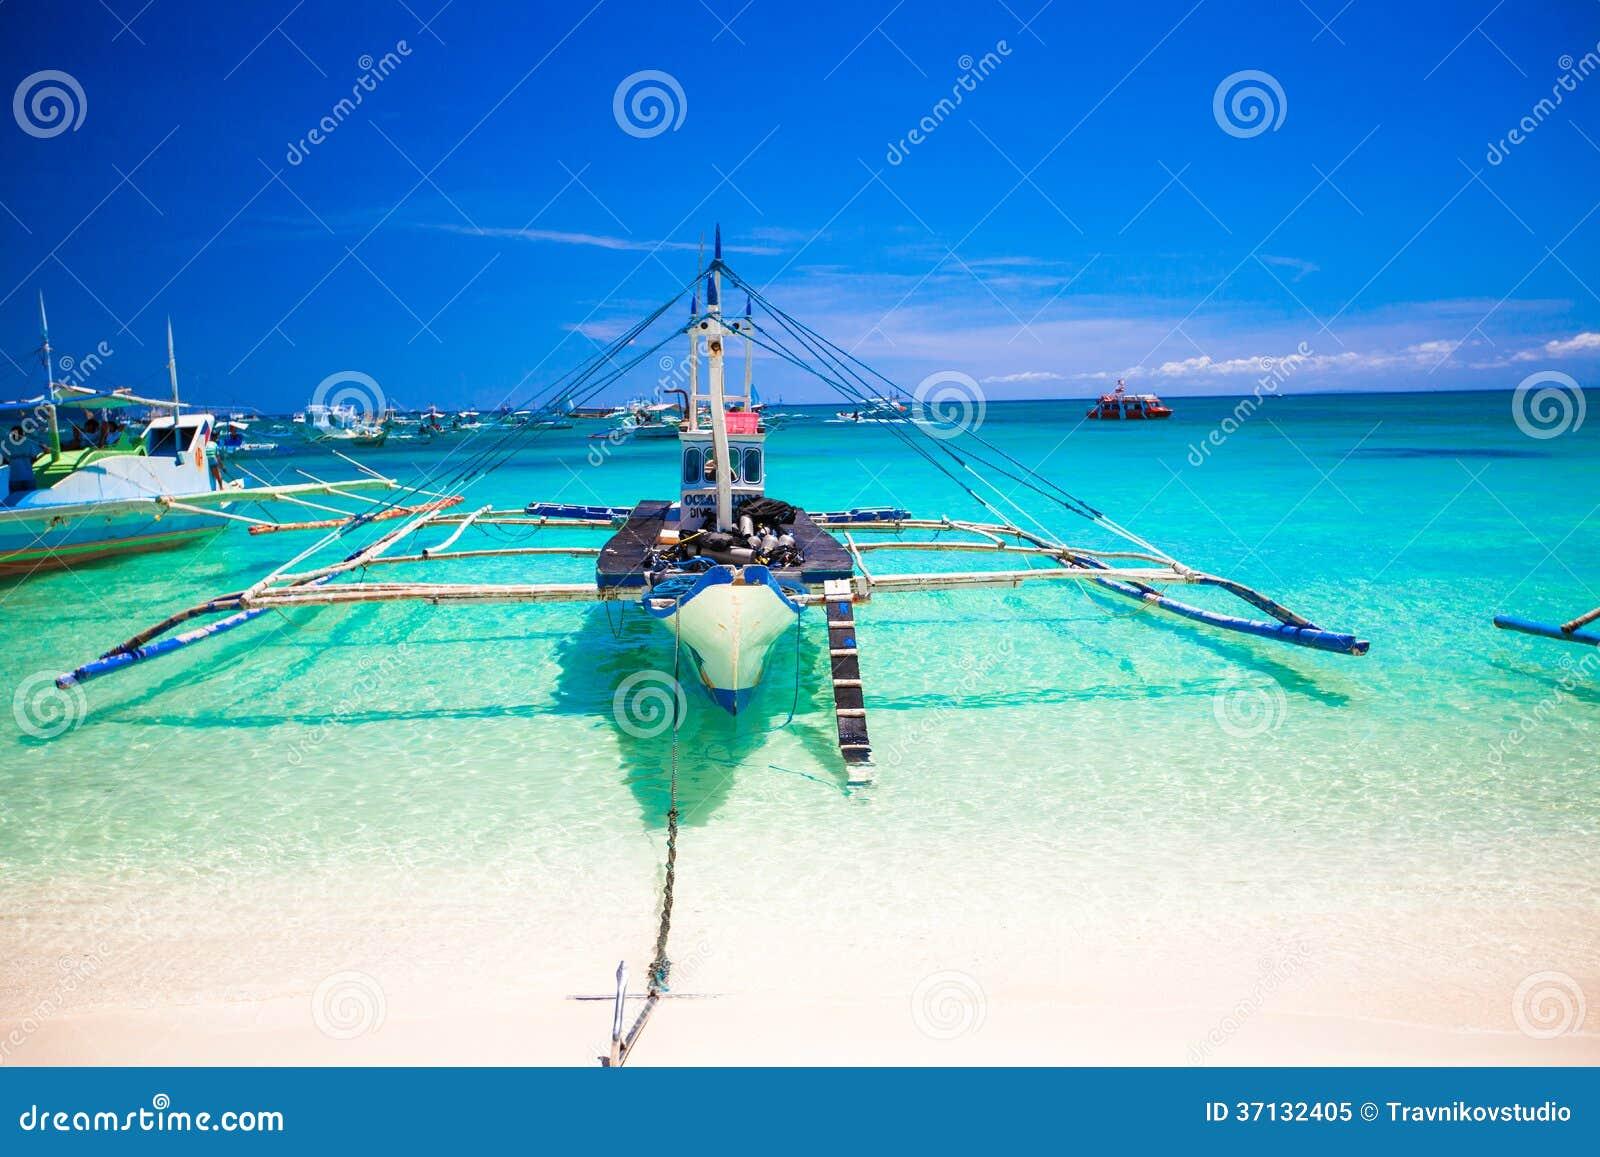 Filipino boat in the turquoise sea, Boracay,